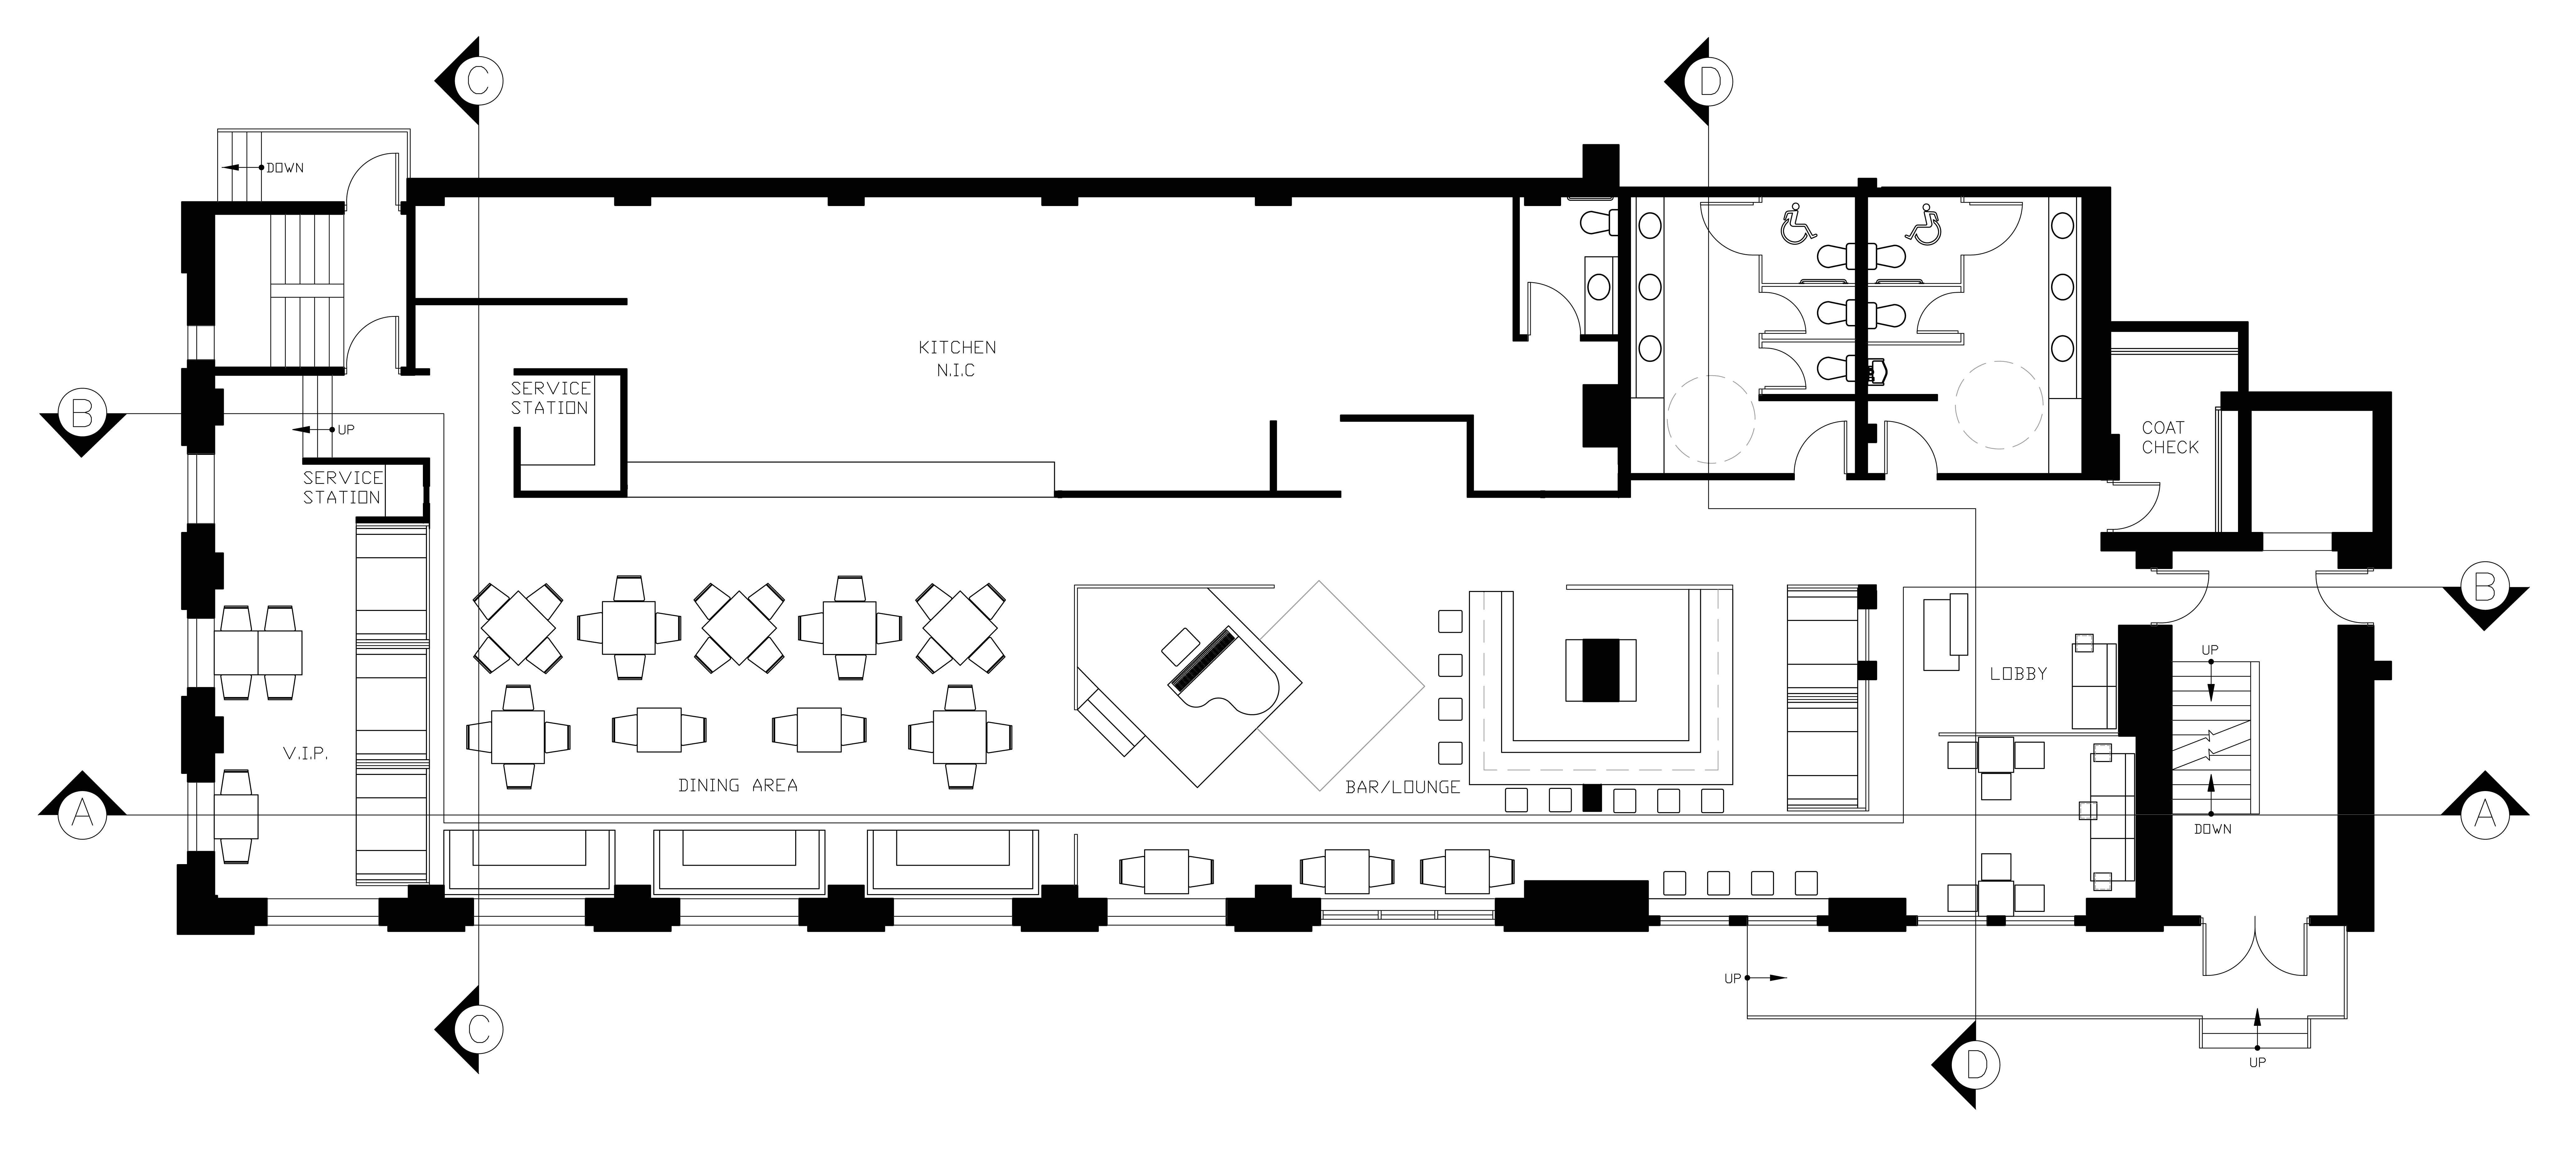 Home Bar Floor Plans Restaurant Floor Plan Layout With Kitchen